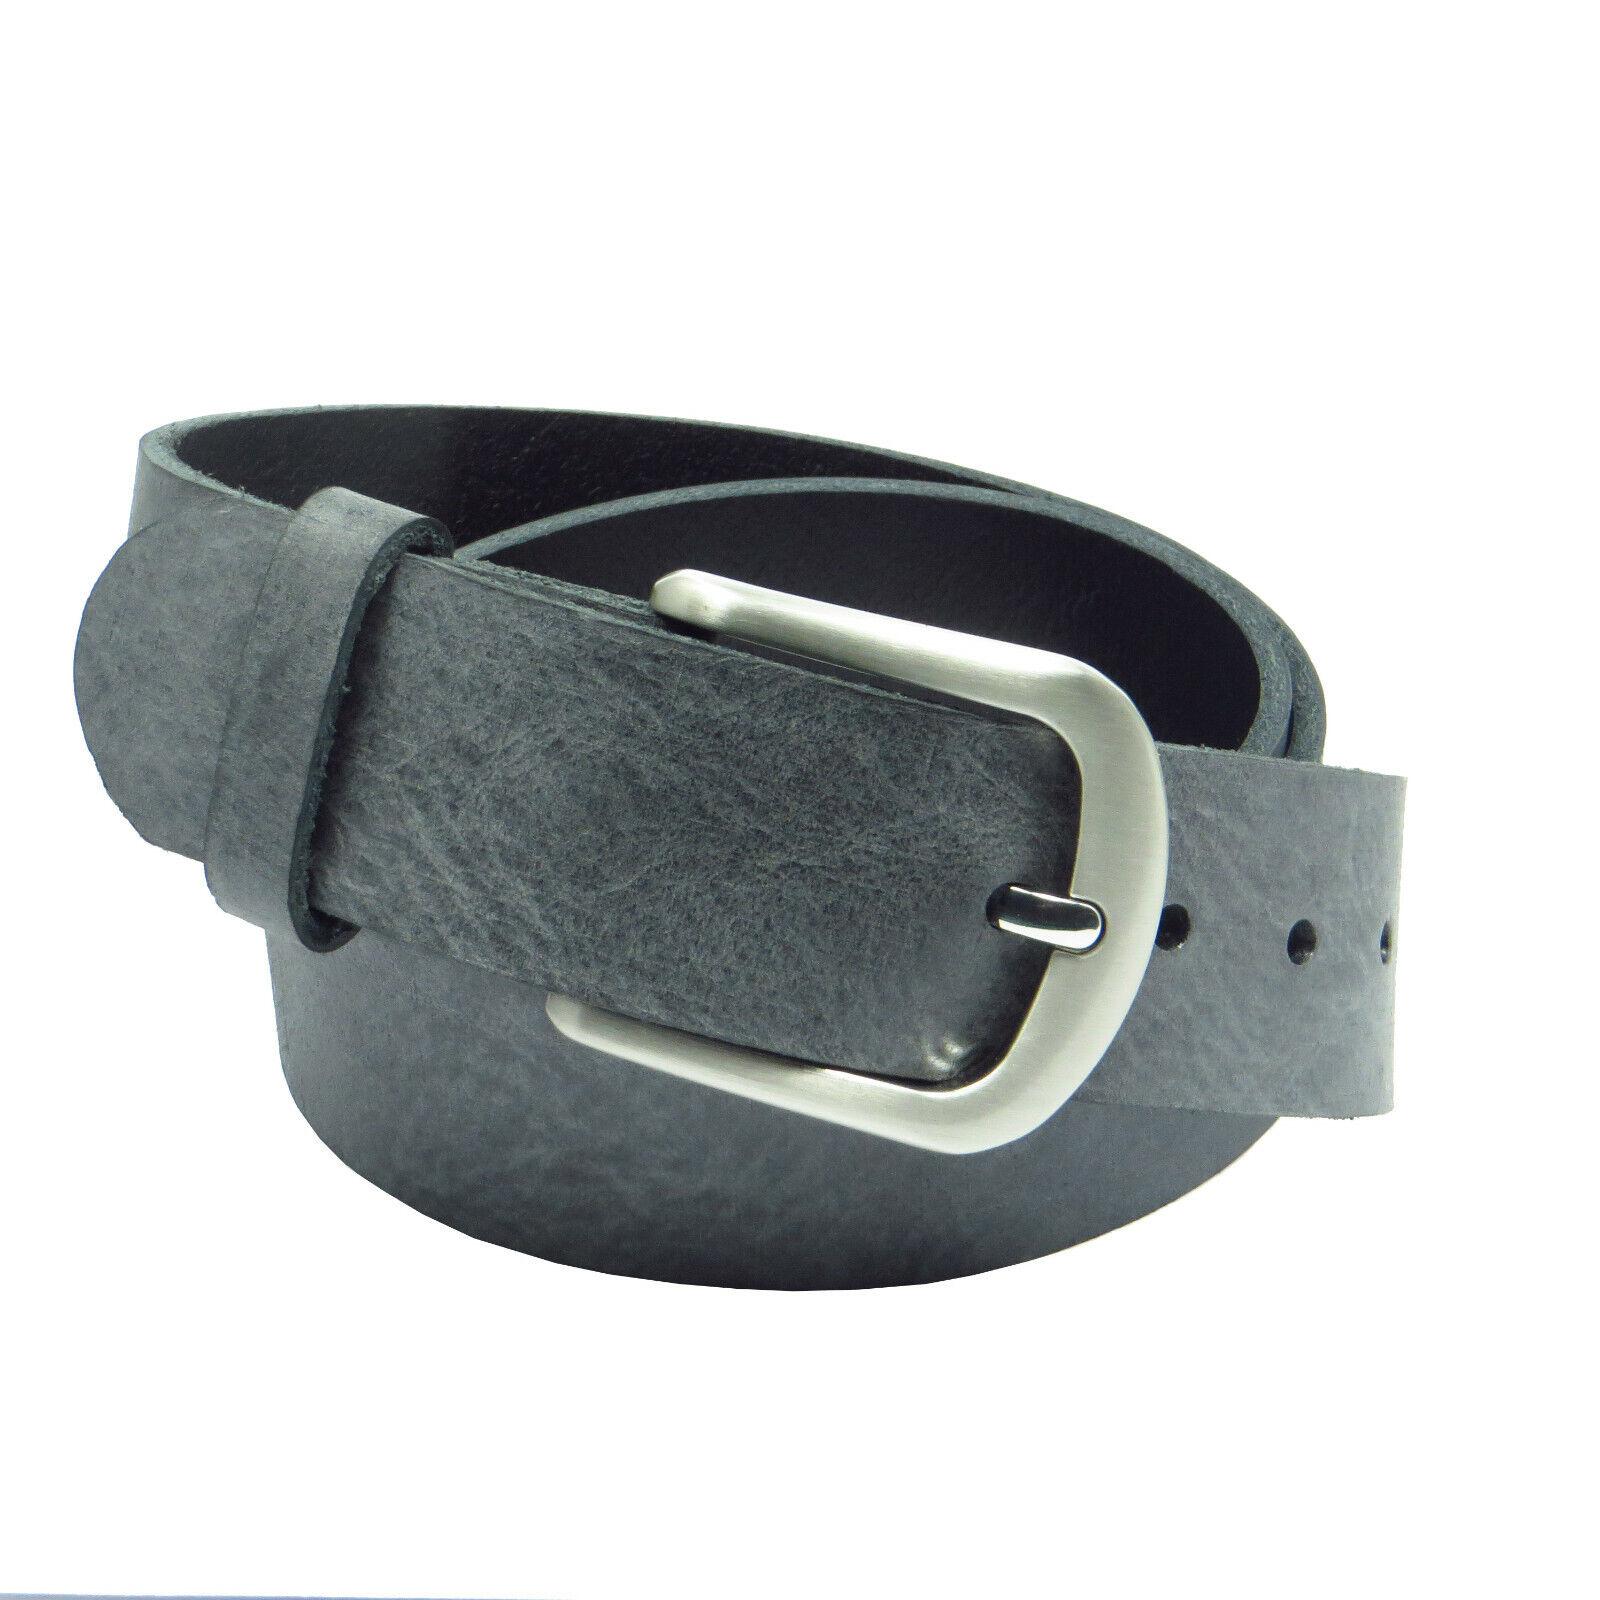 Ledergürtel 4 cm breit dunkelgrau eigener Fertigung Rindsleder Bundweite messen